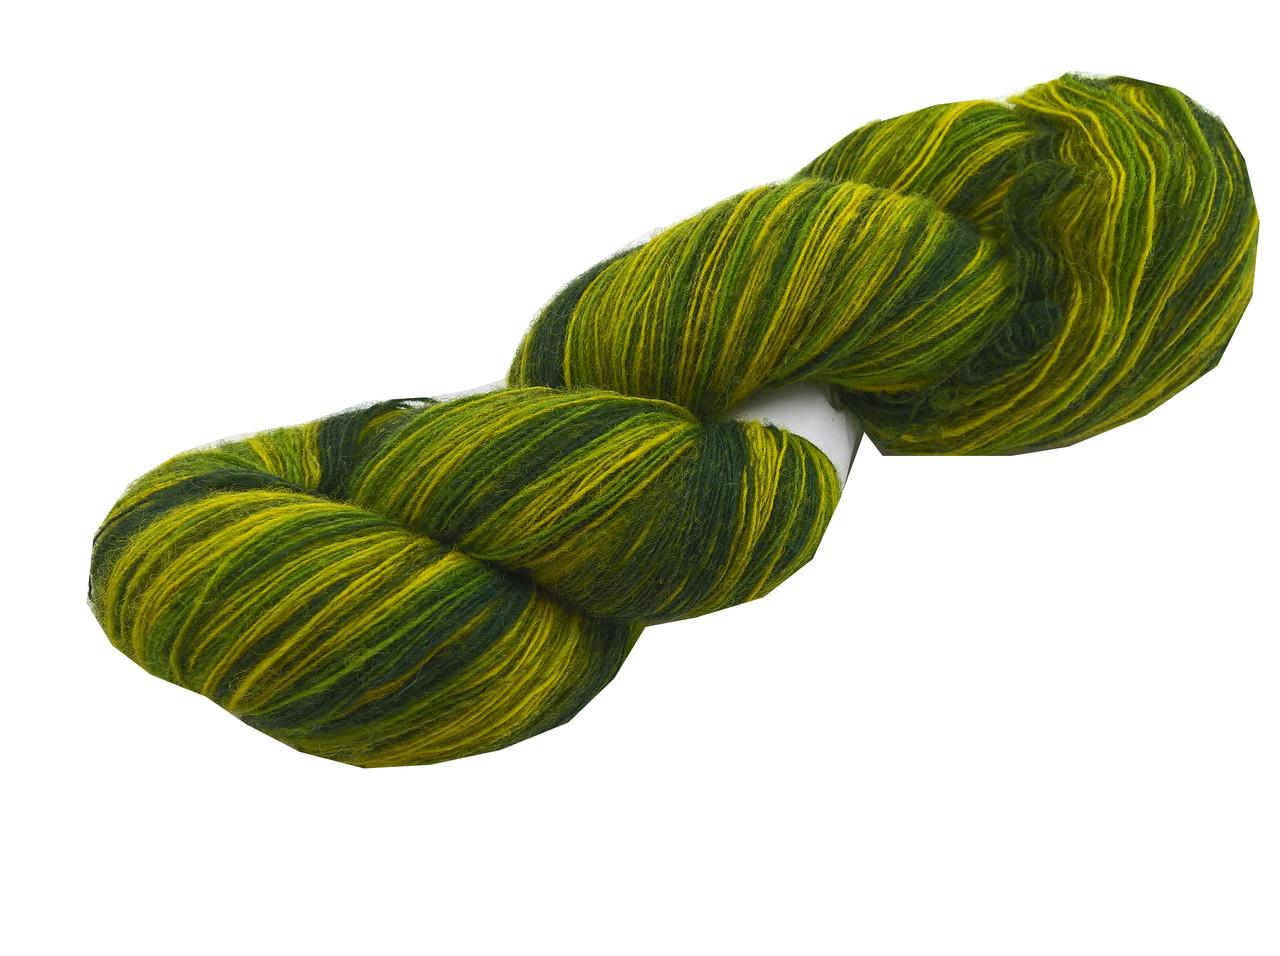 Artistic yarn 8/1, Green Yellow(зелёно-жёлтый)